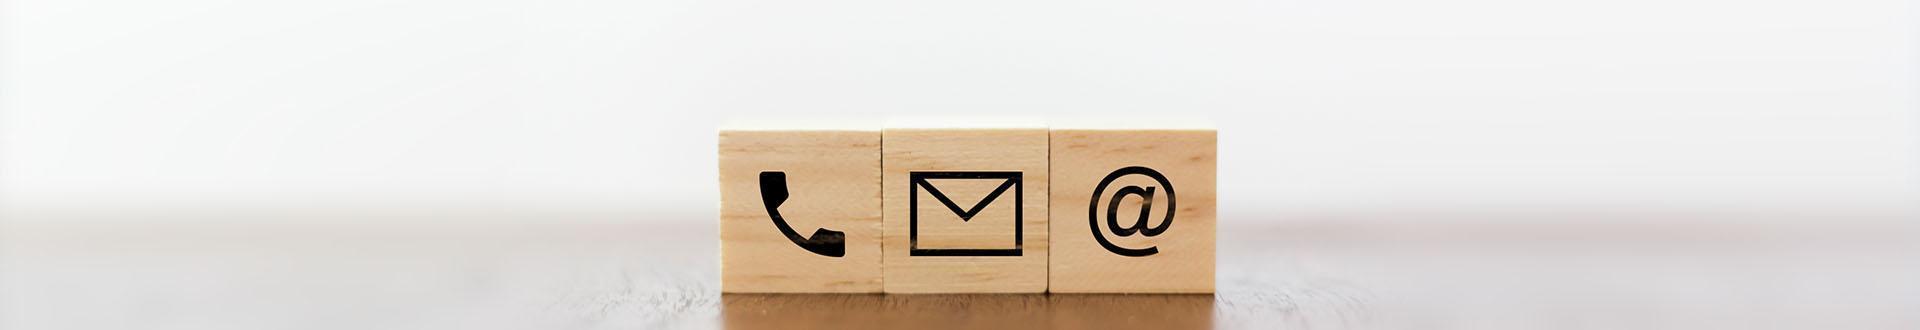 banner kontakt - drewniane kostki